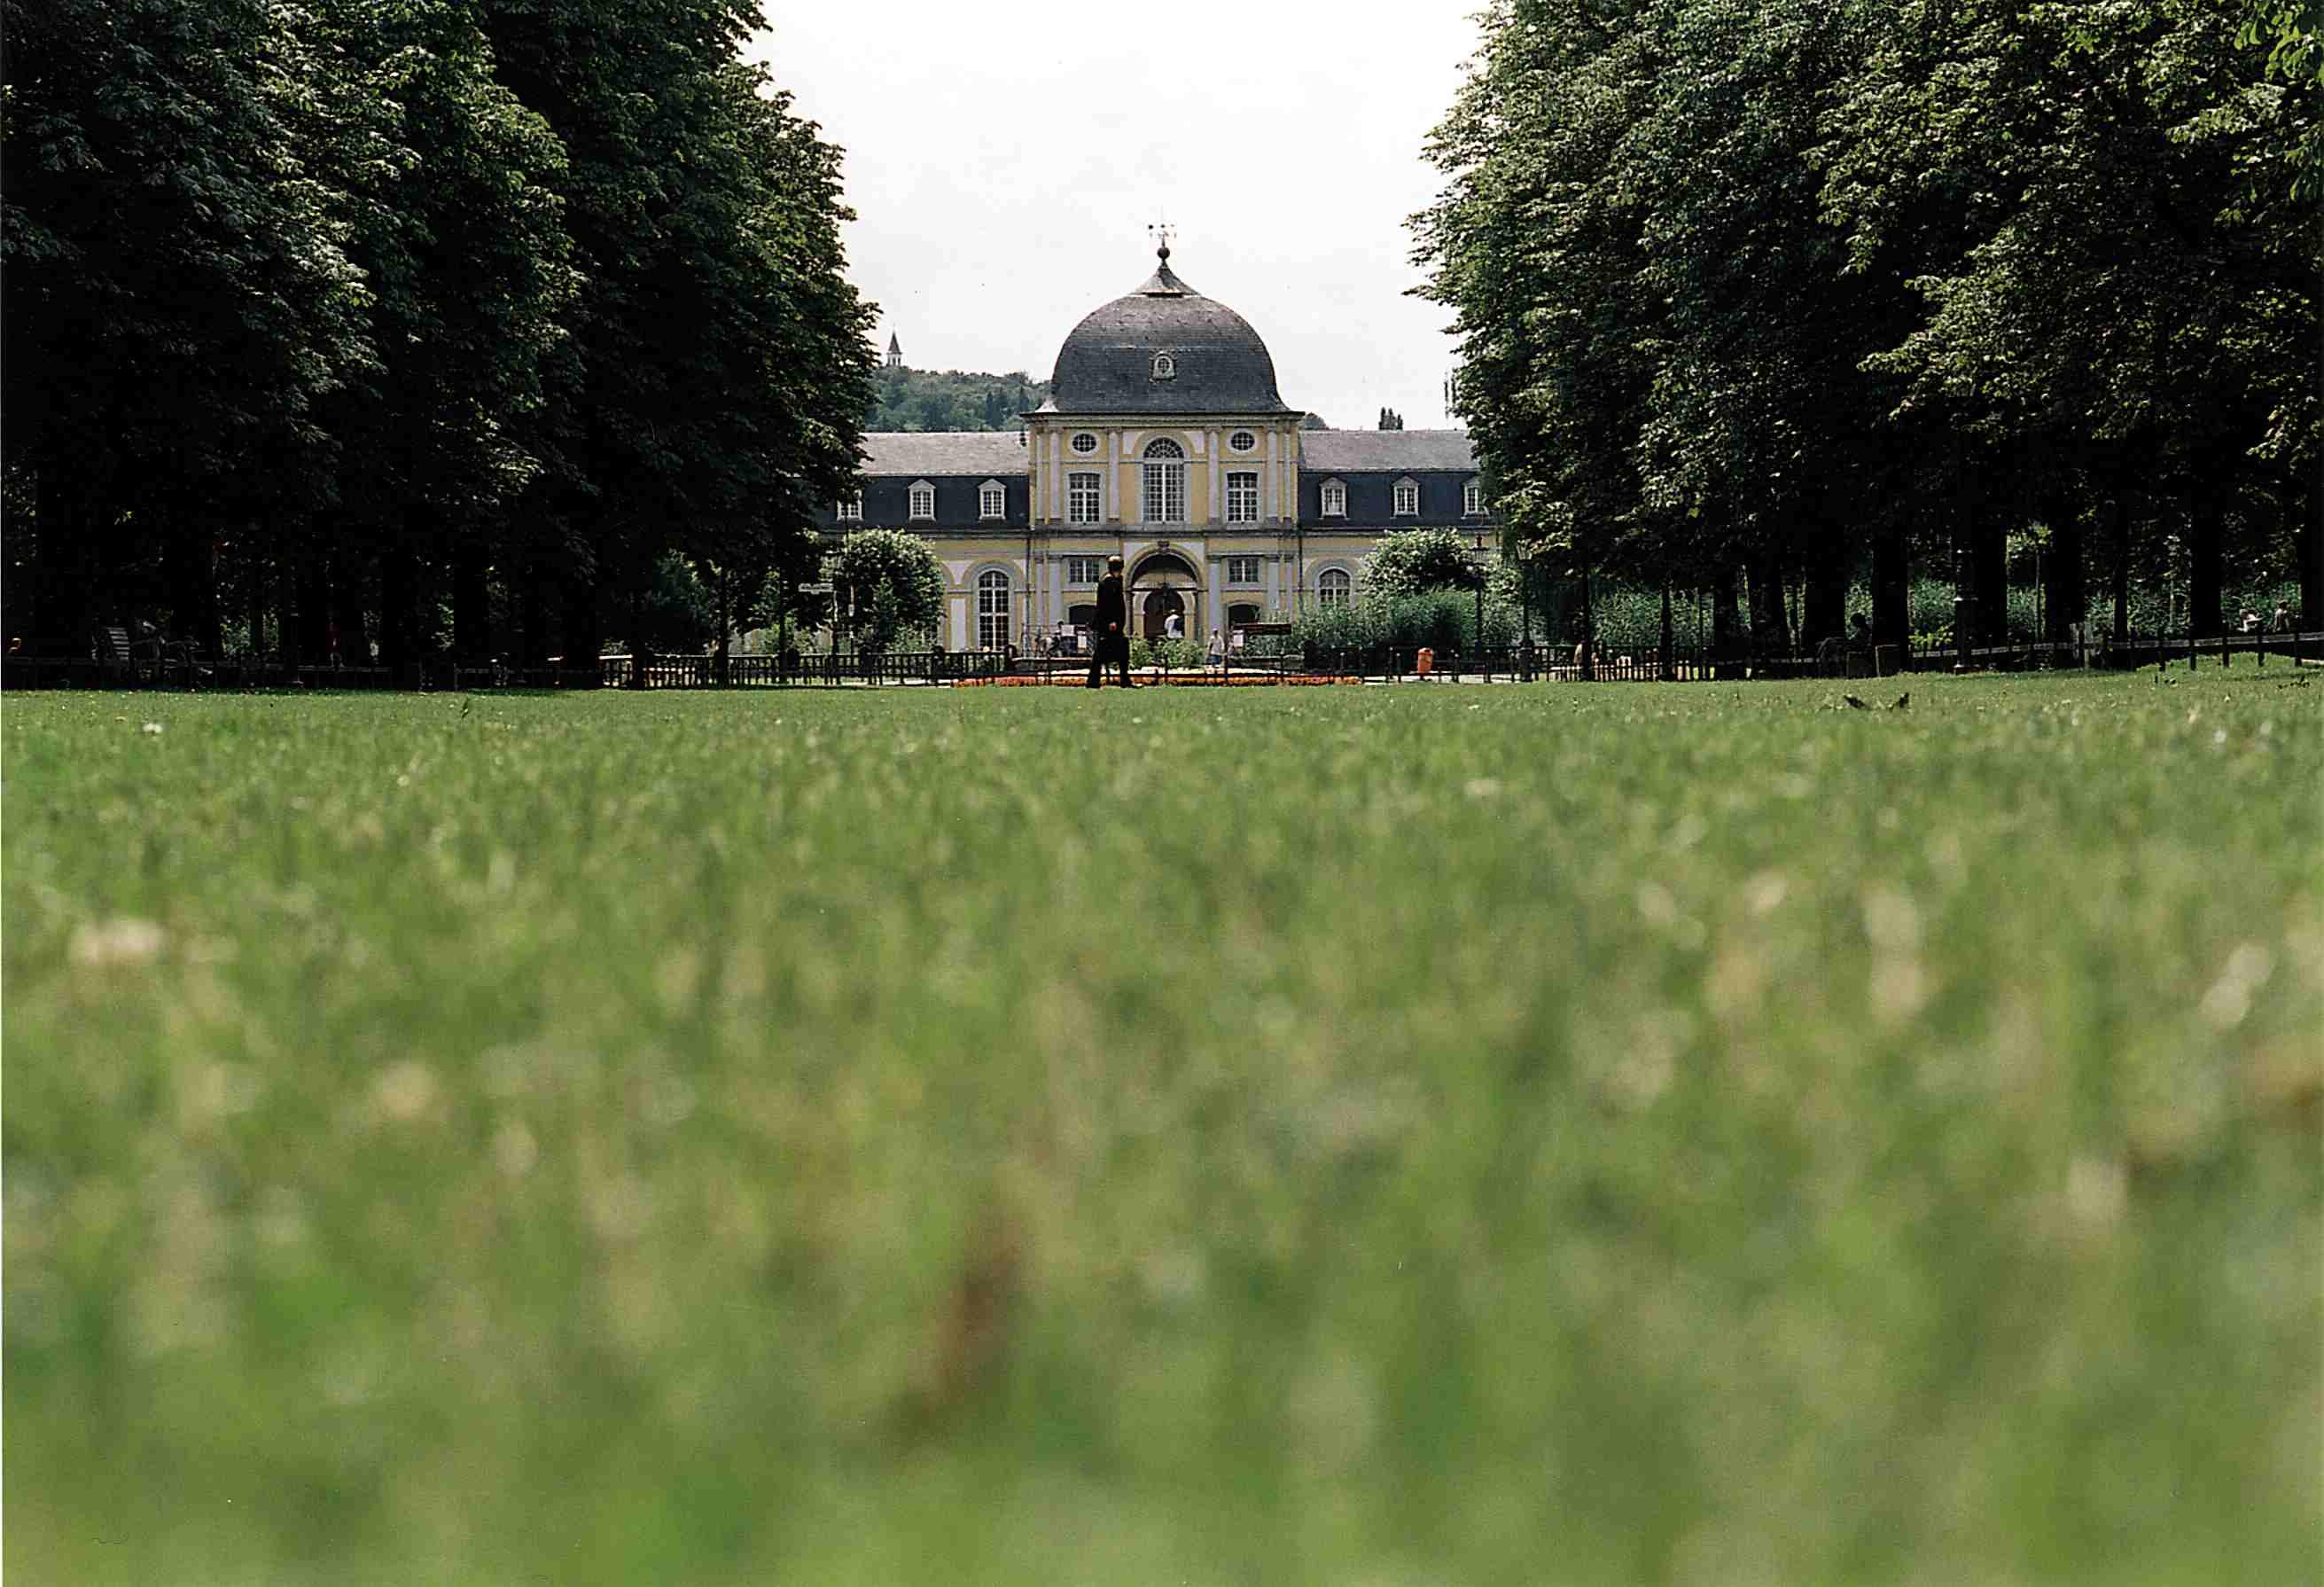 Poppelsdorf Palace, Copyright: Heilke Fischer / University Bonn